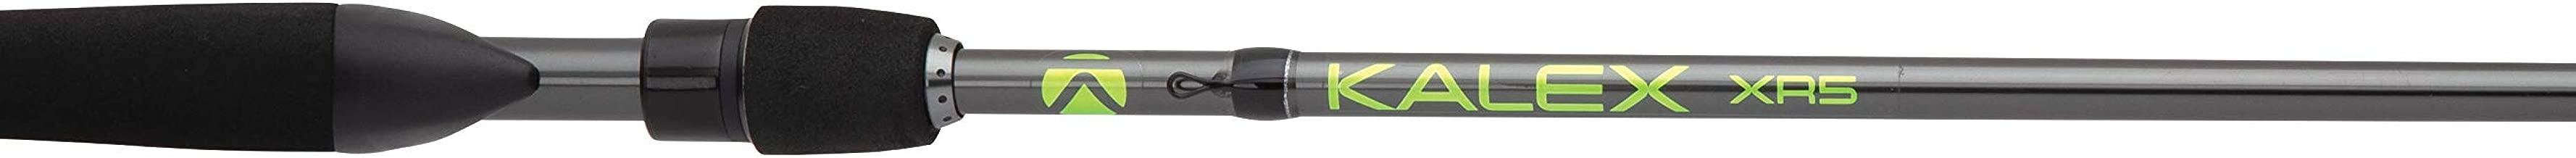 Kalex XR5 Rod - Spinning & Casting